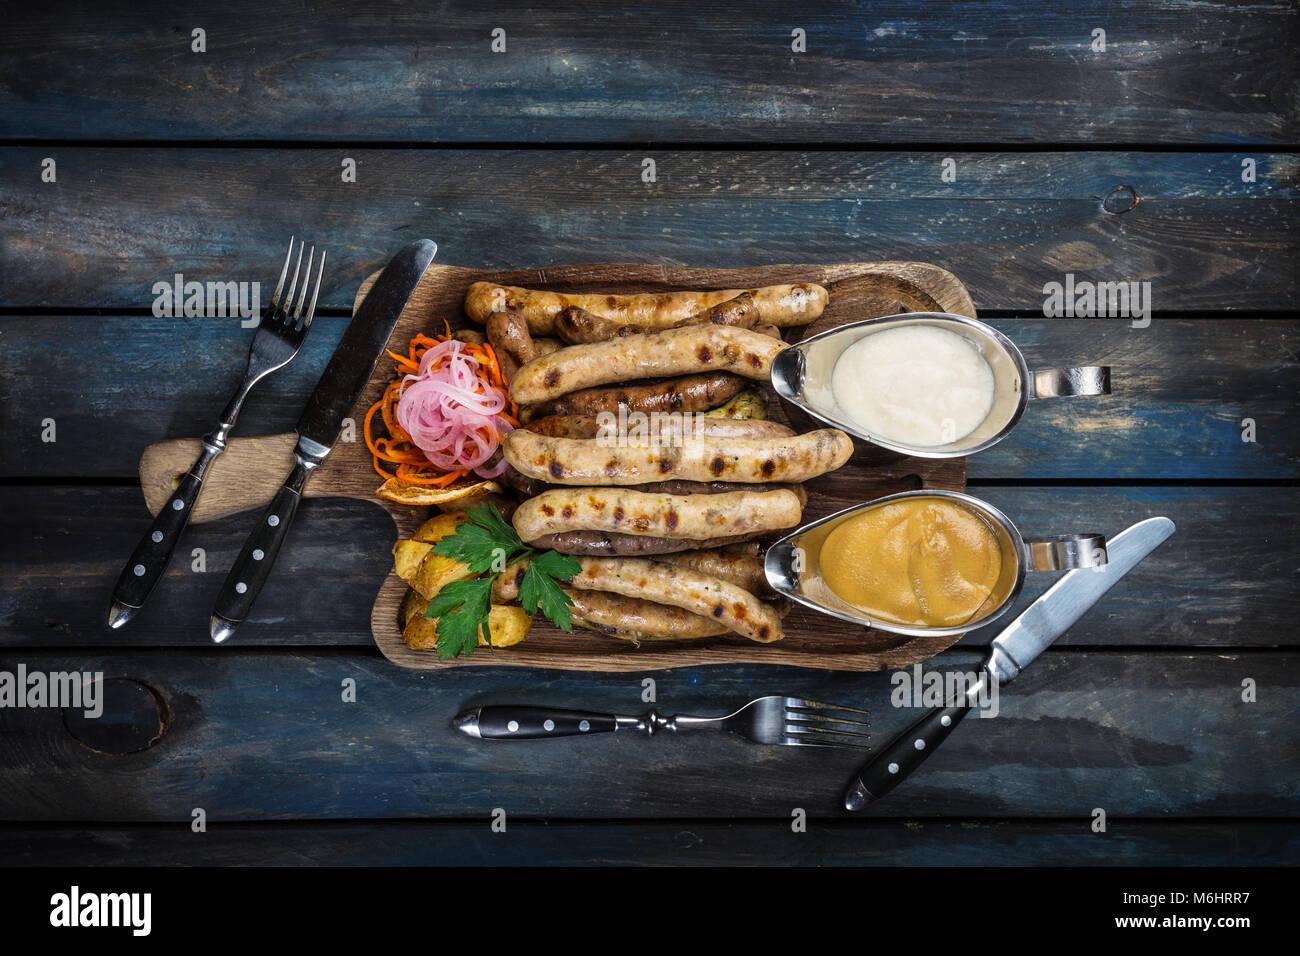 Smoked sausage with sauerkraut and potato wedges. - Stock Image